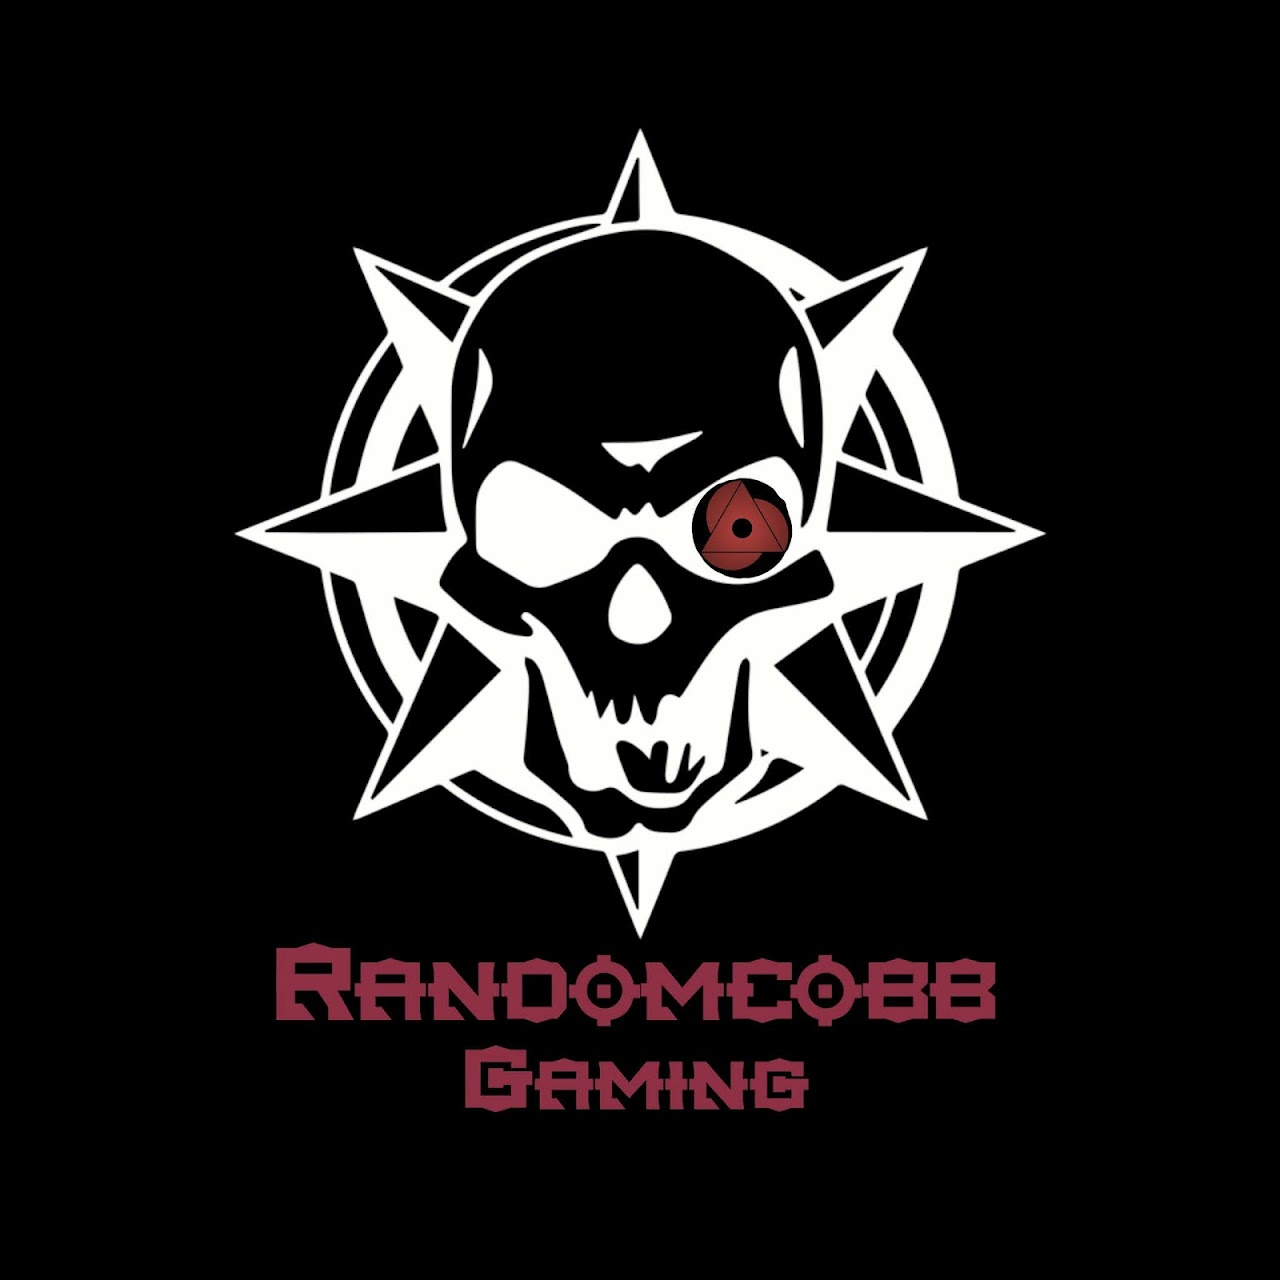 Randomcobb Gaming